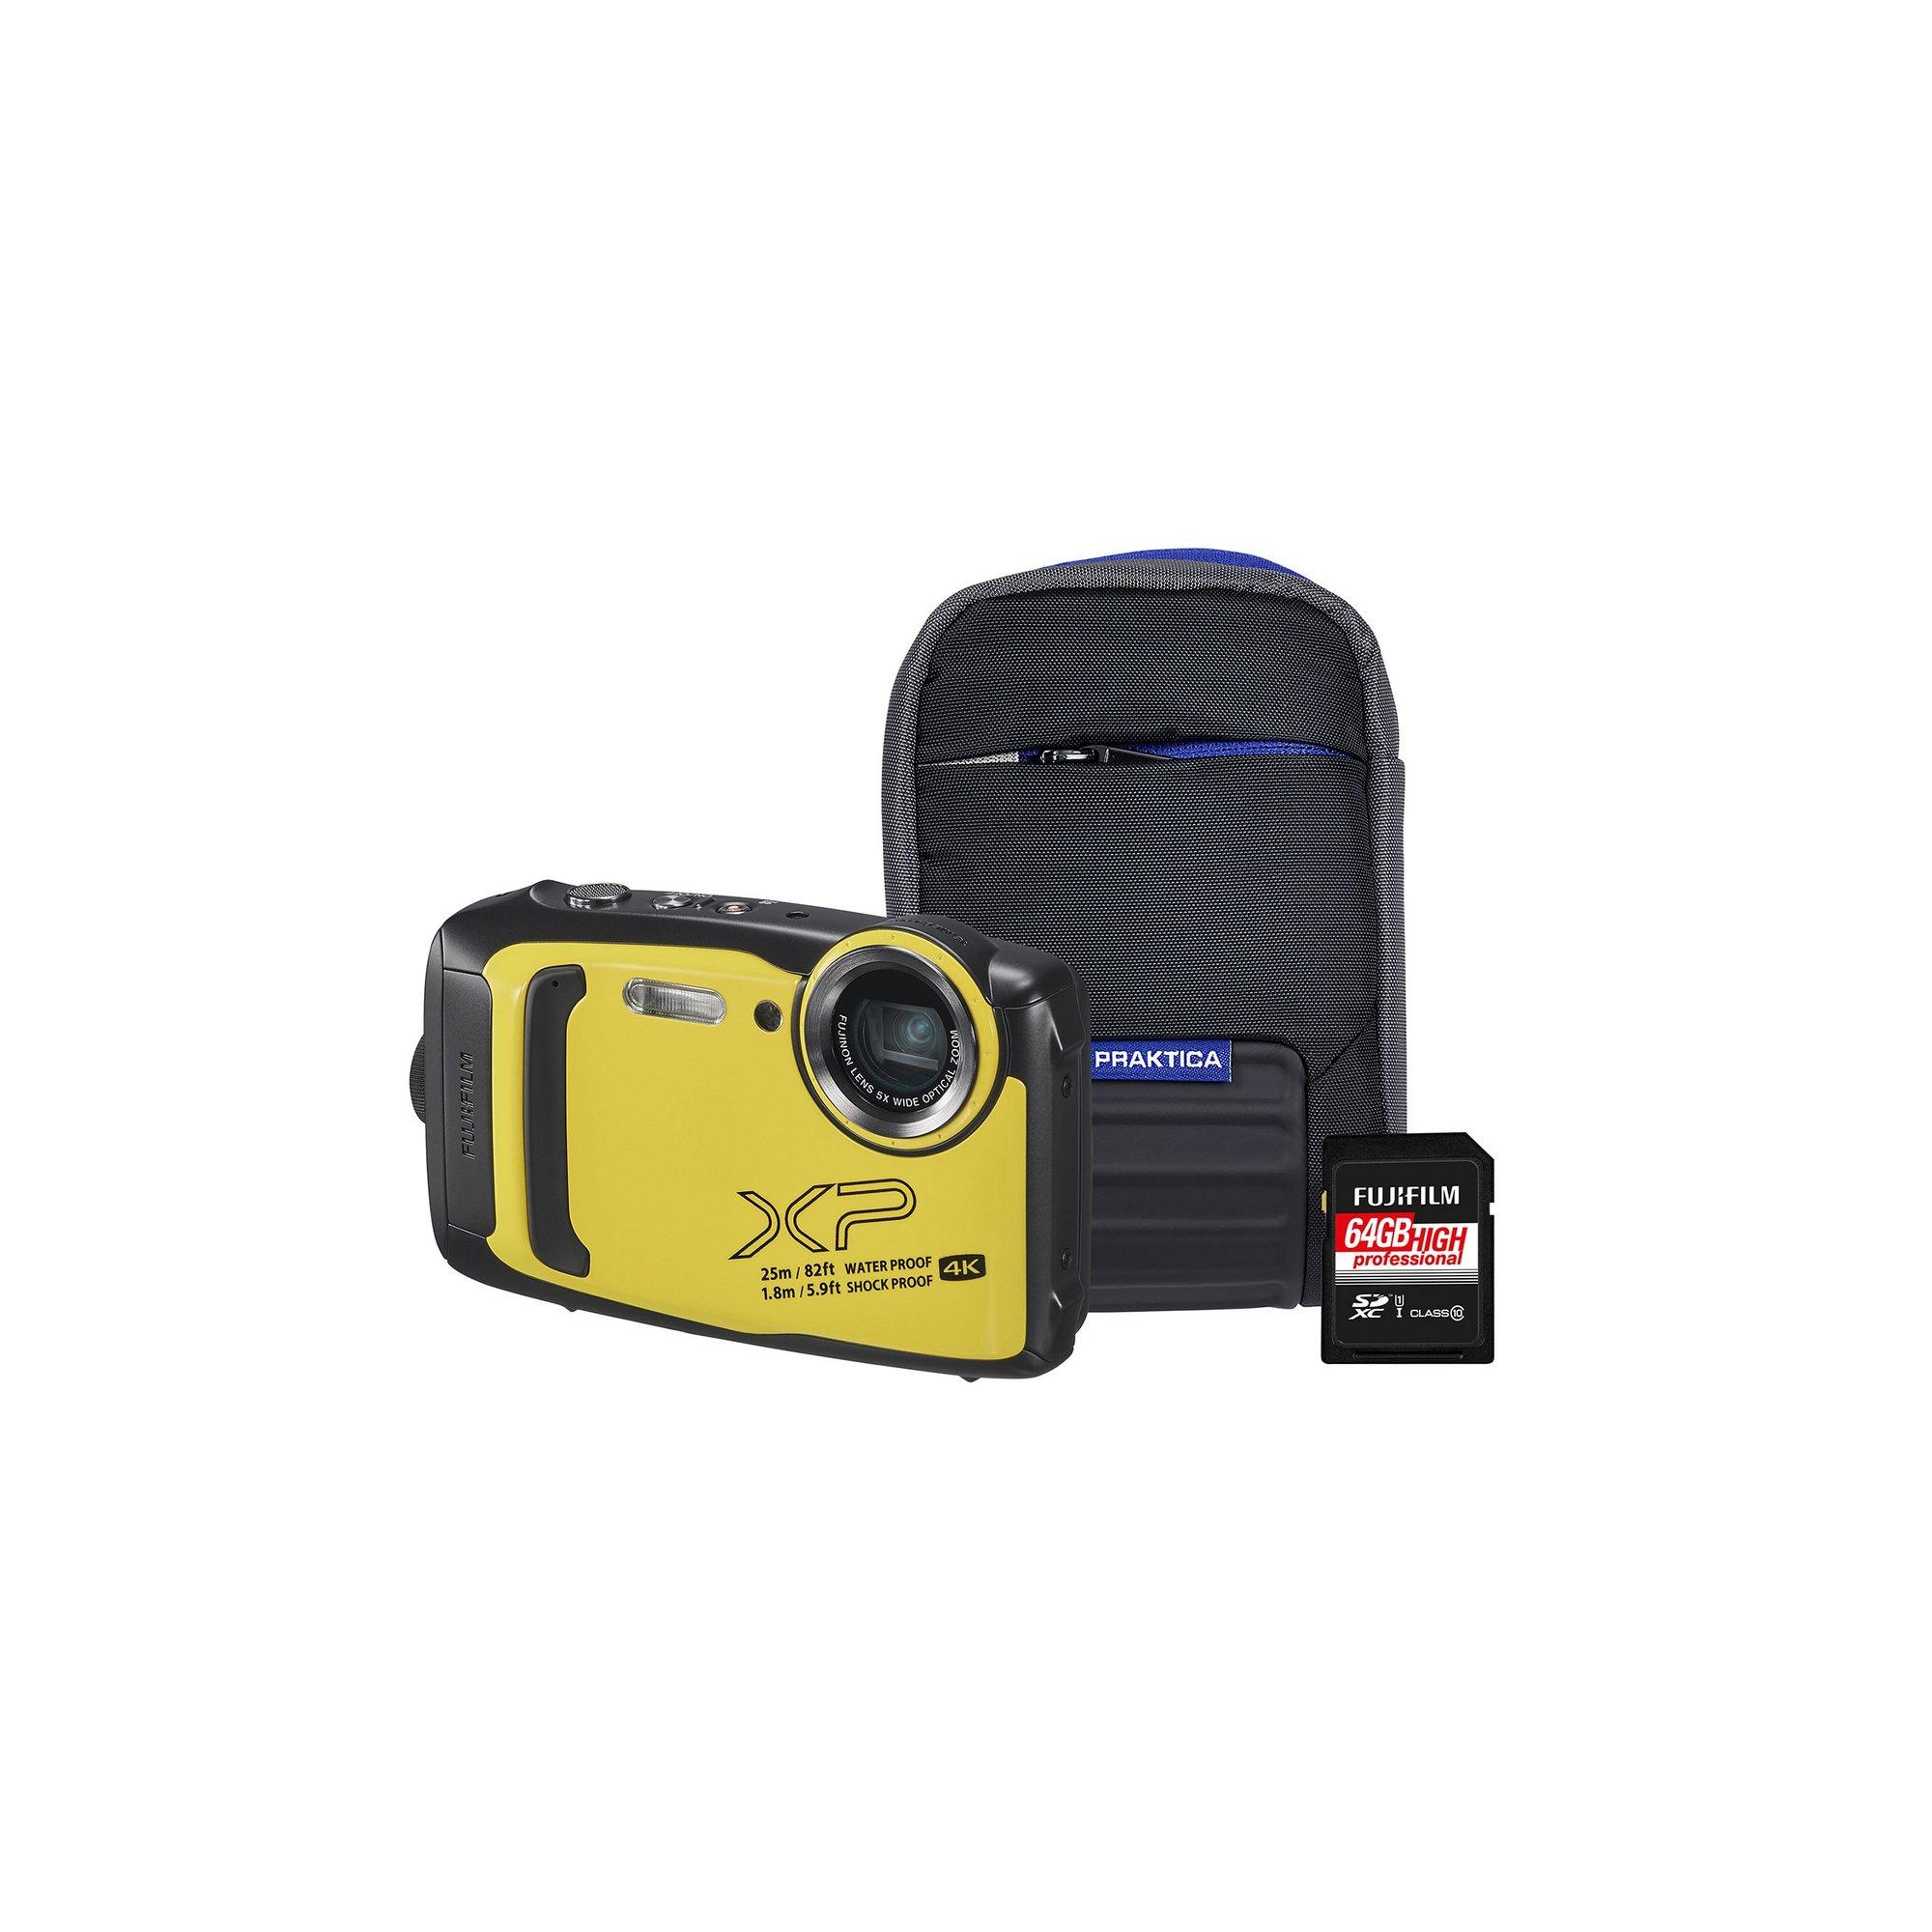 Image of Fujifilm Finepix XP140 Tough Camera Kit